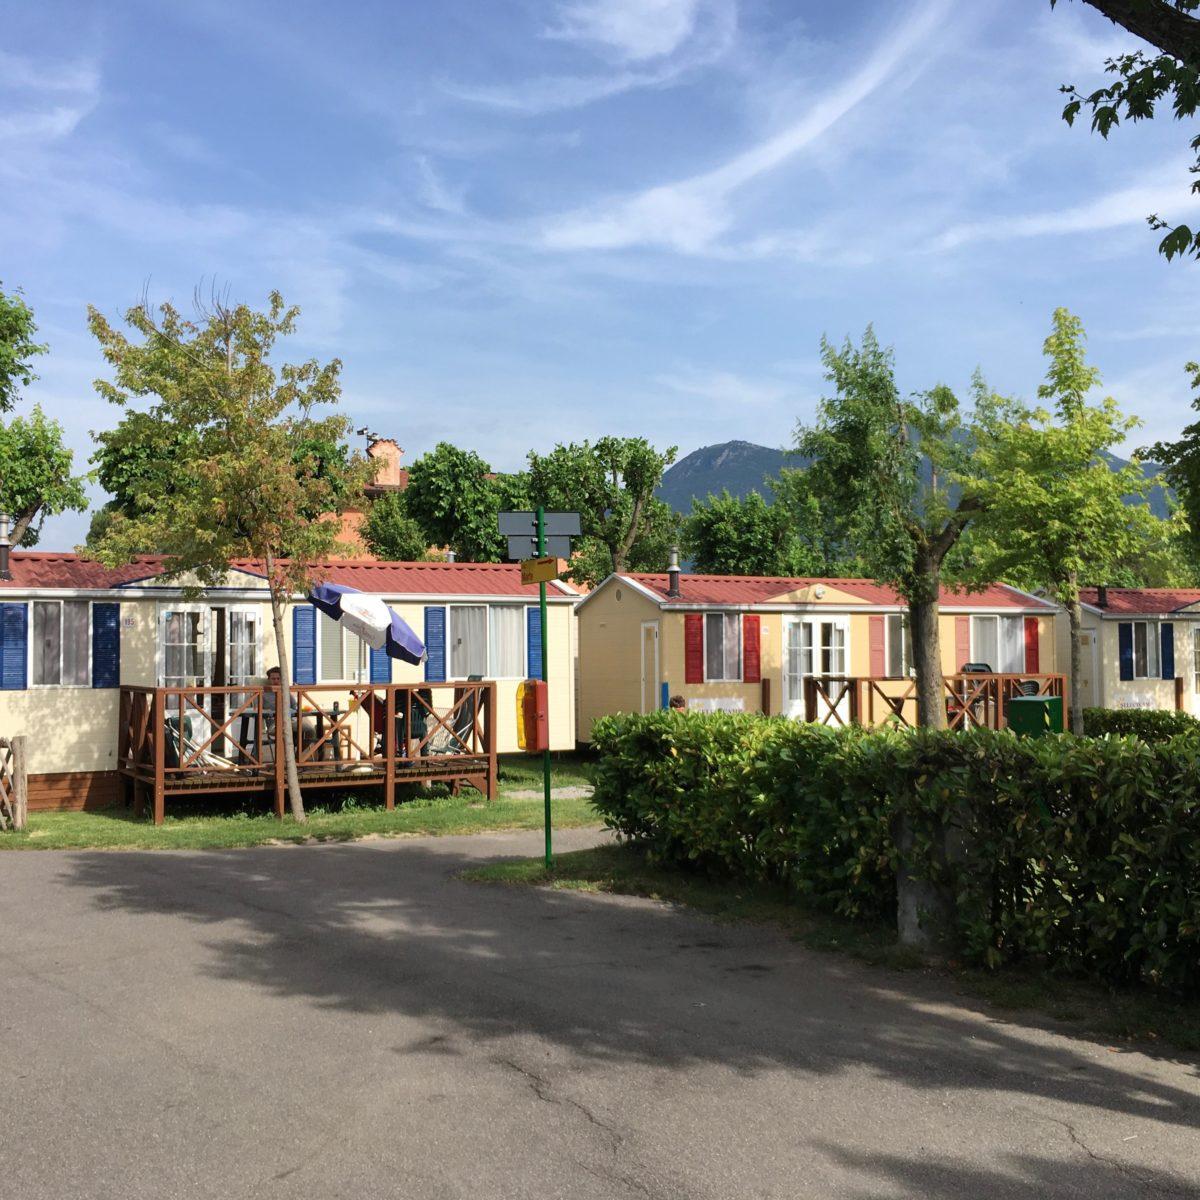 Am Campingplatz Campeggio del Sole in Iseo